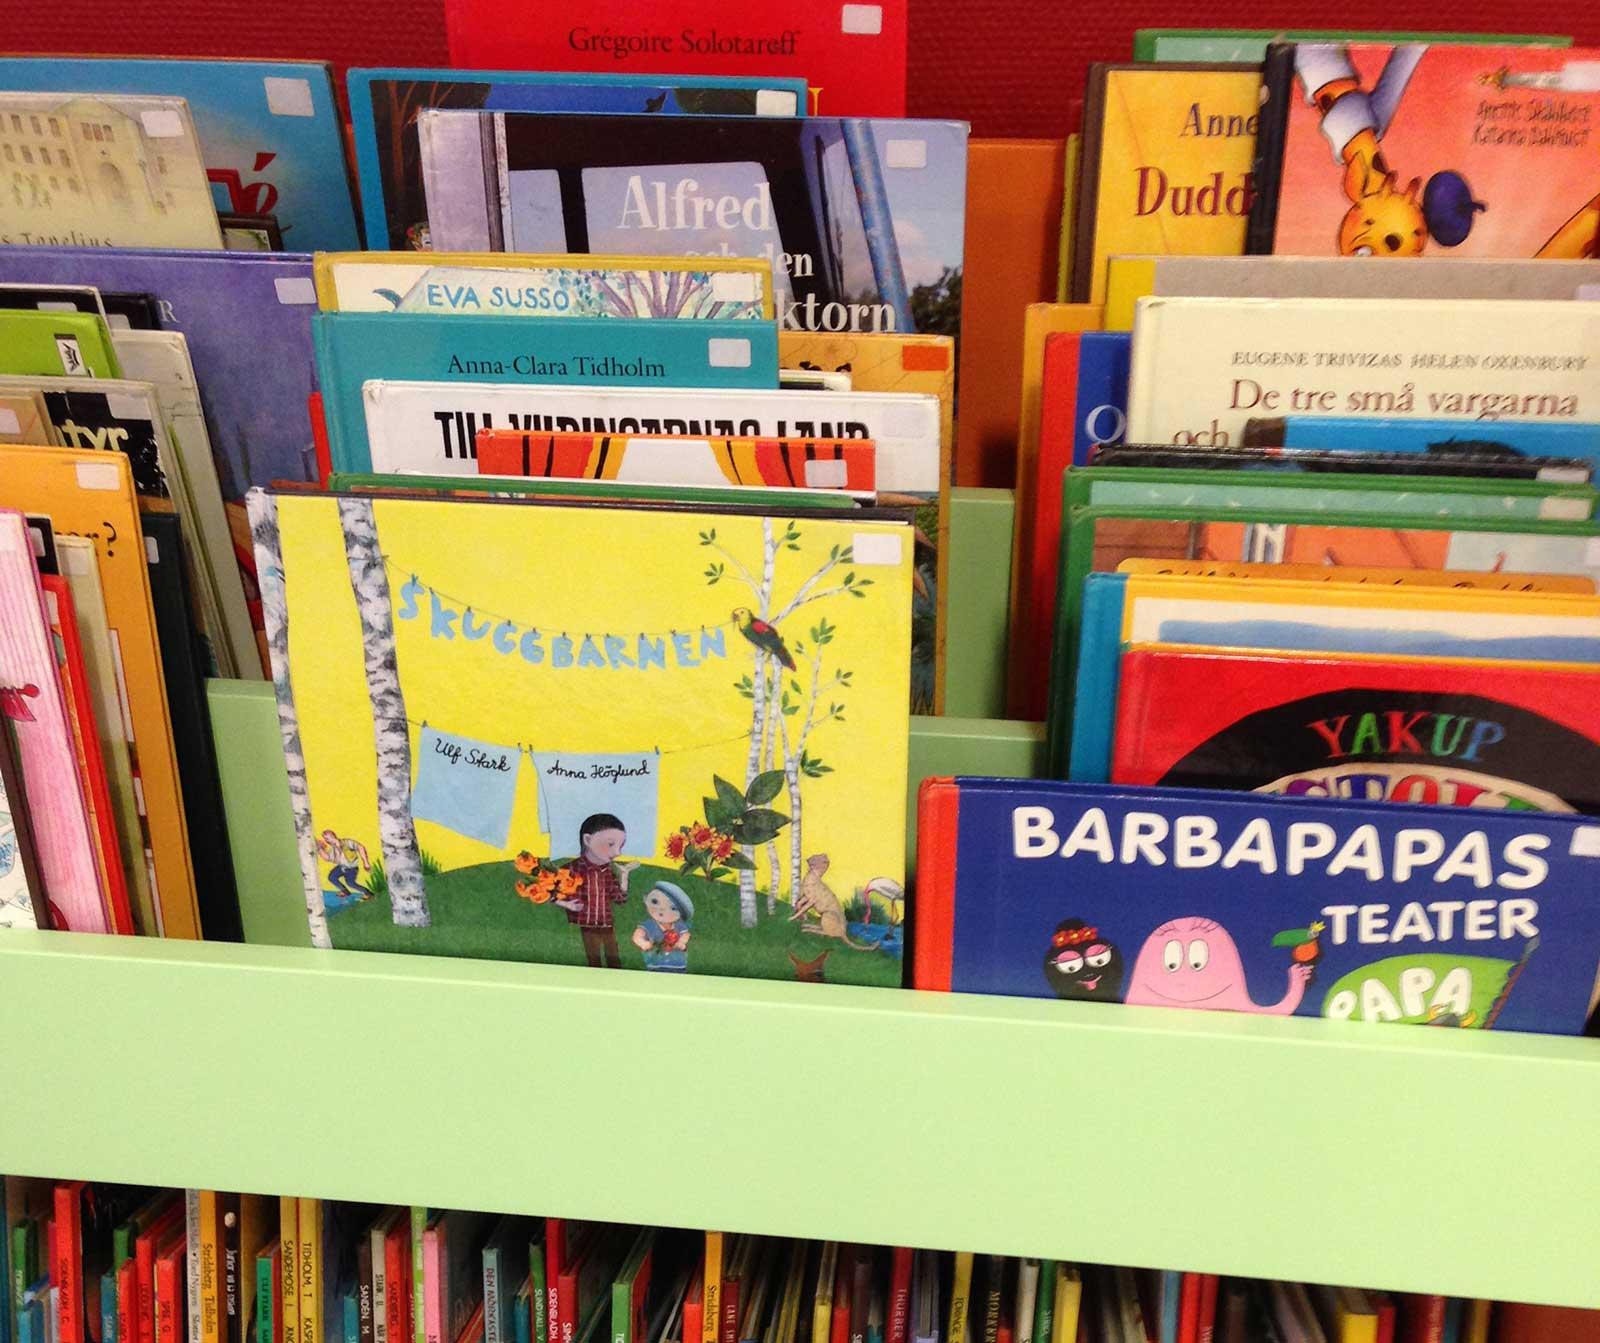 Barnavdelningen på biblioteket i Staffanstorp